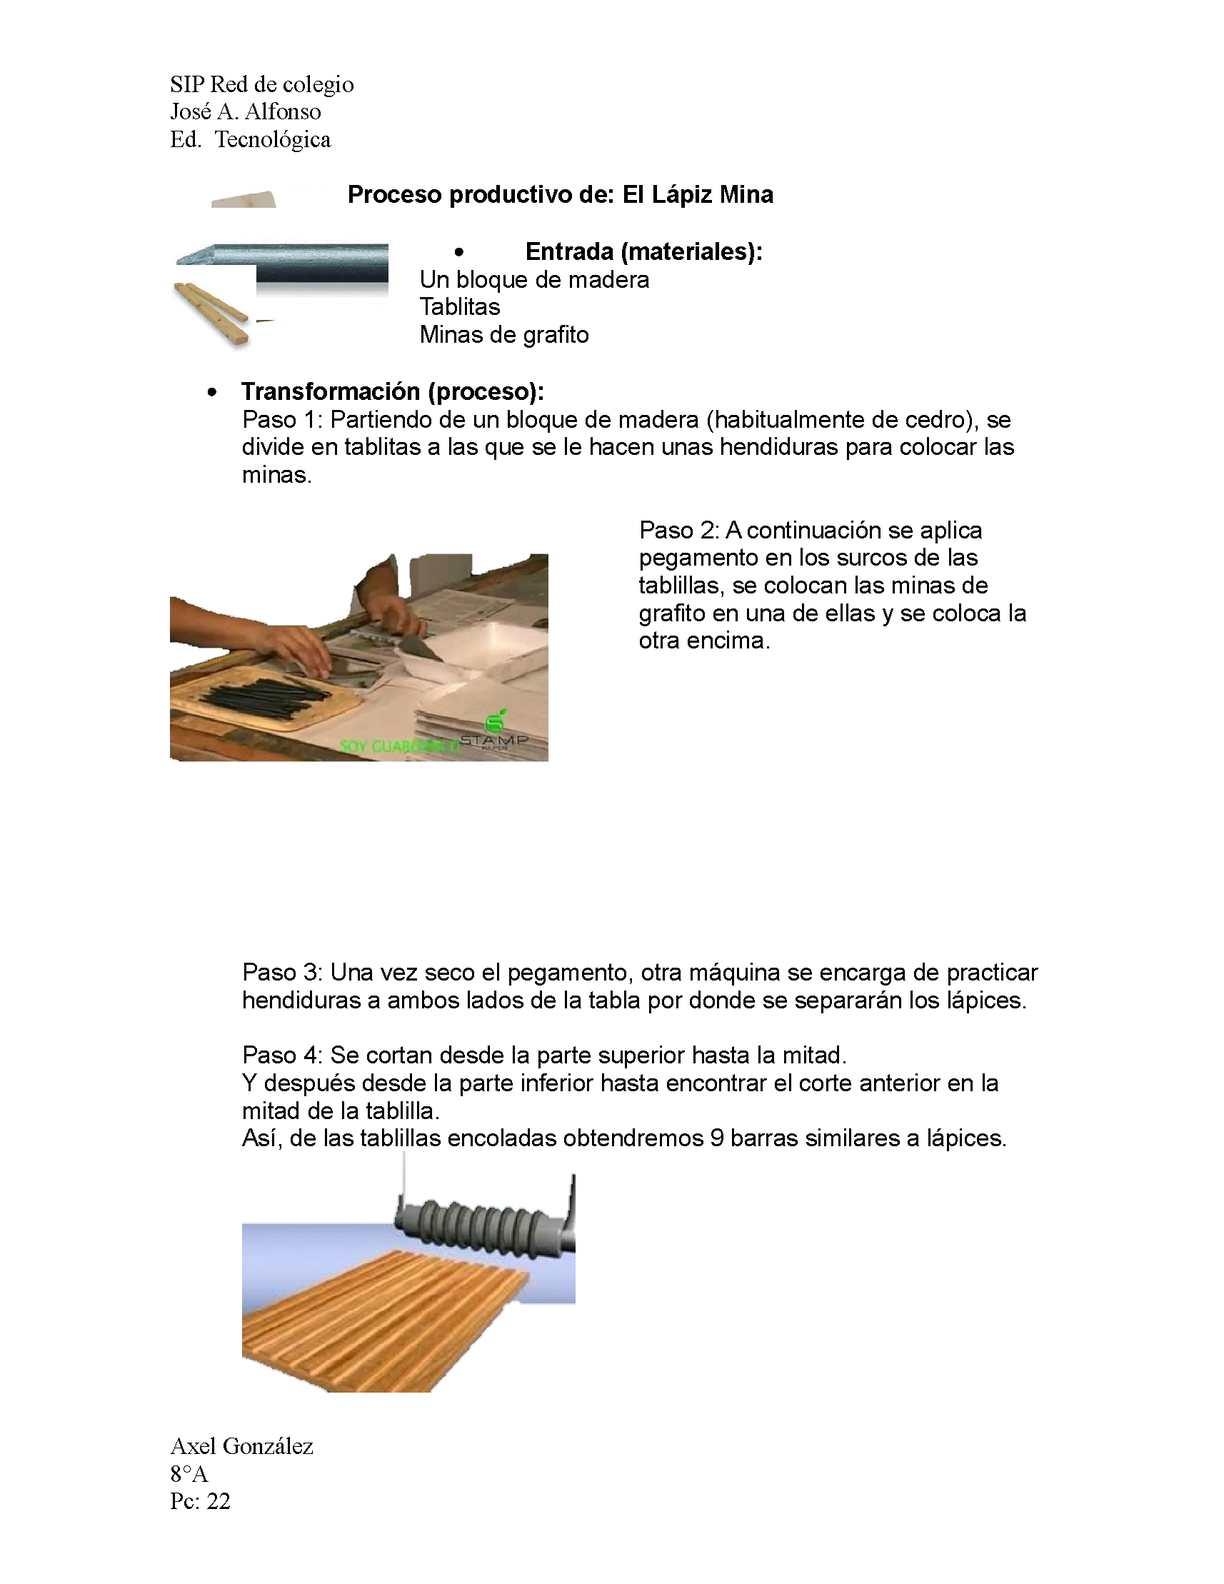 Calam o proceso productivo del lapiz - Como se aplica el microcemento paso a paso ...